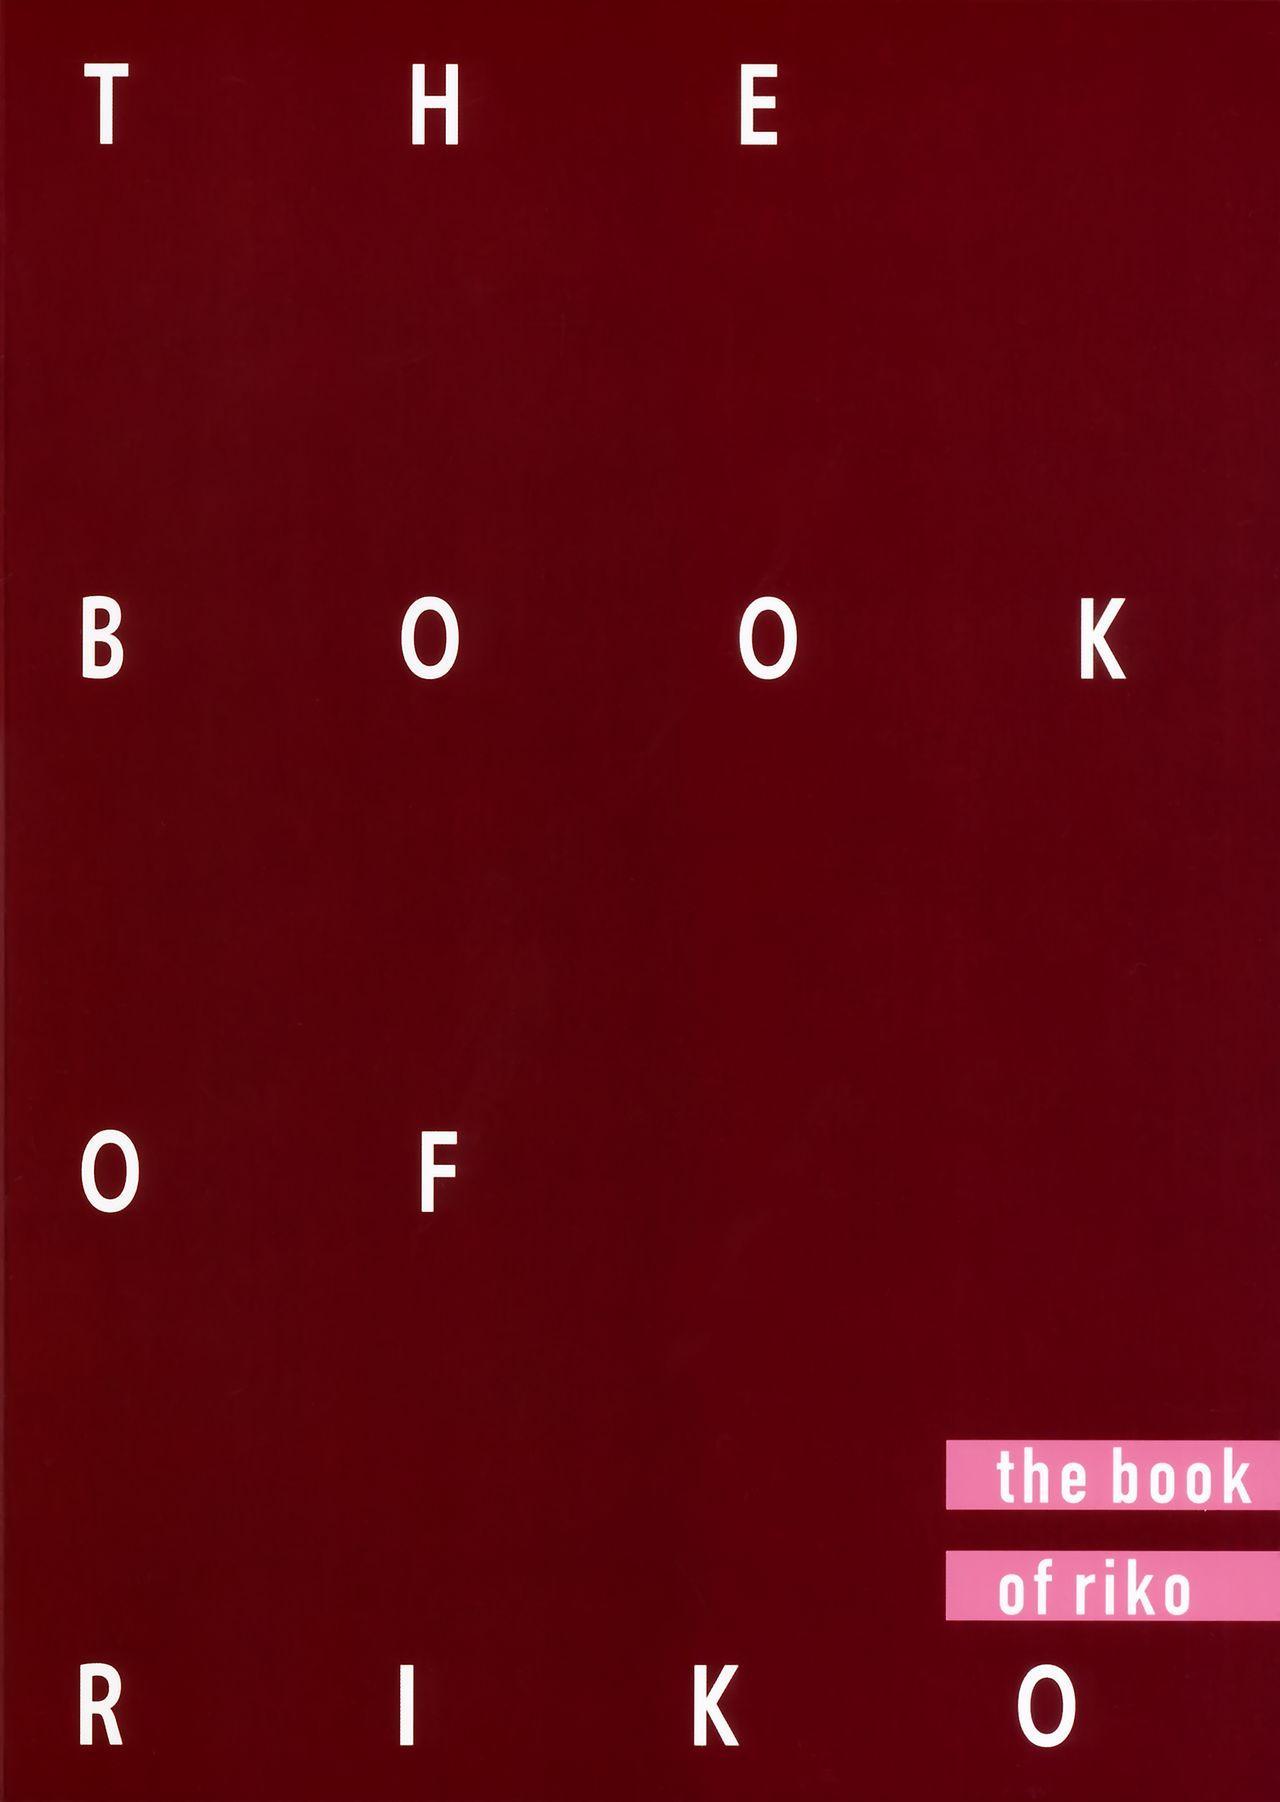 THE BOOK OF RIKO 16